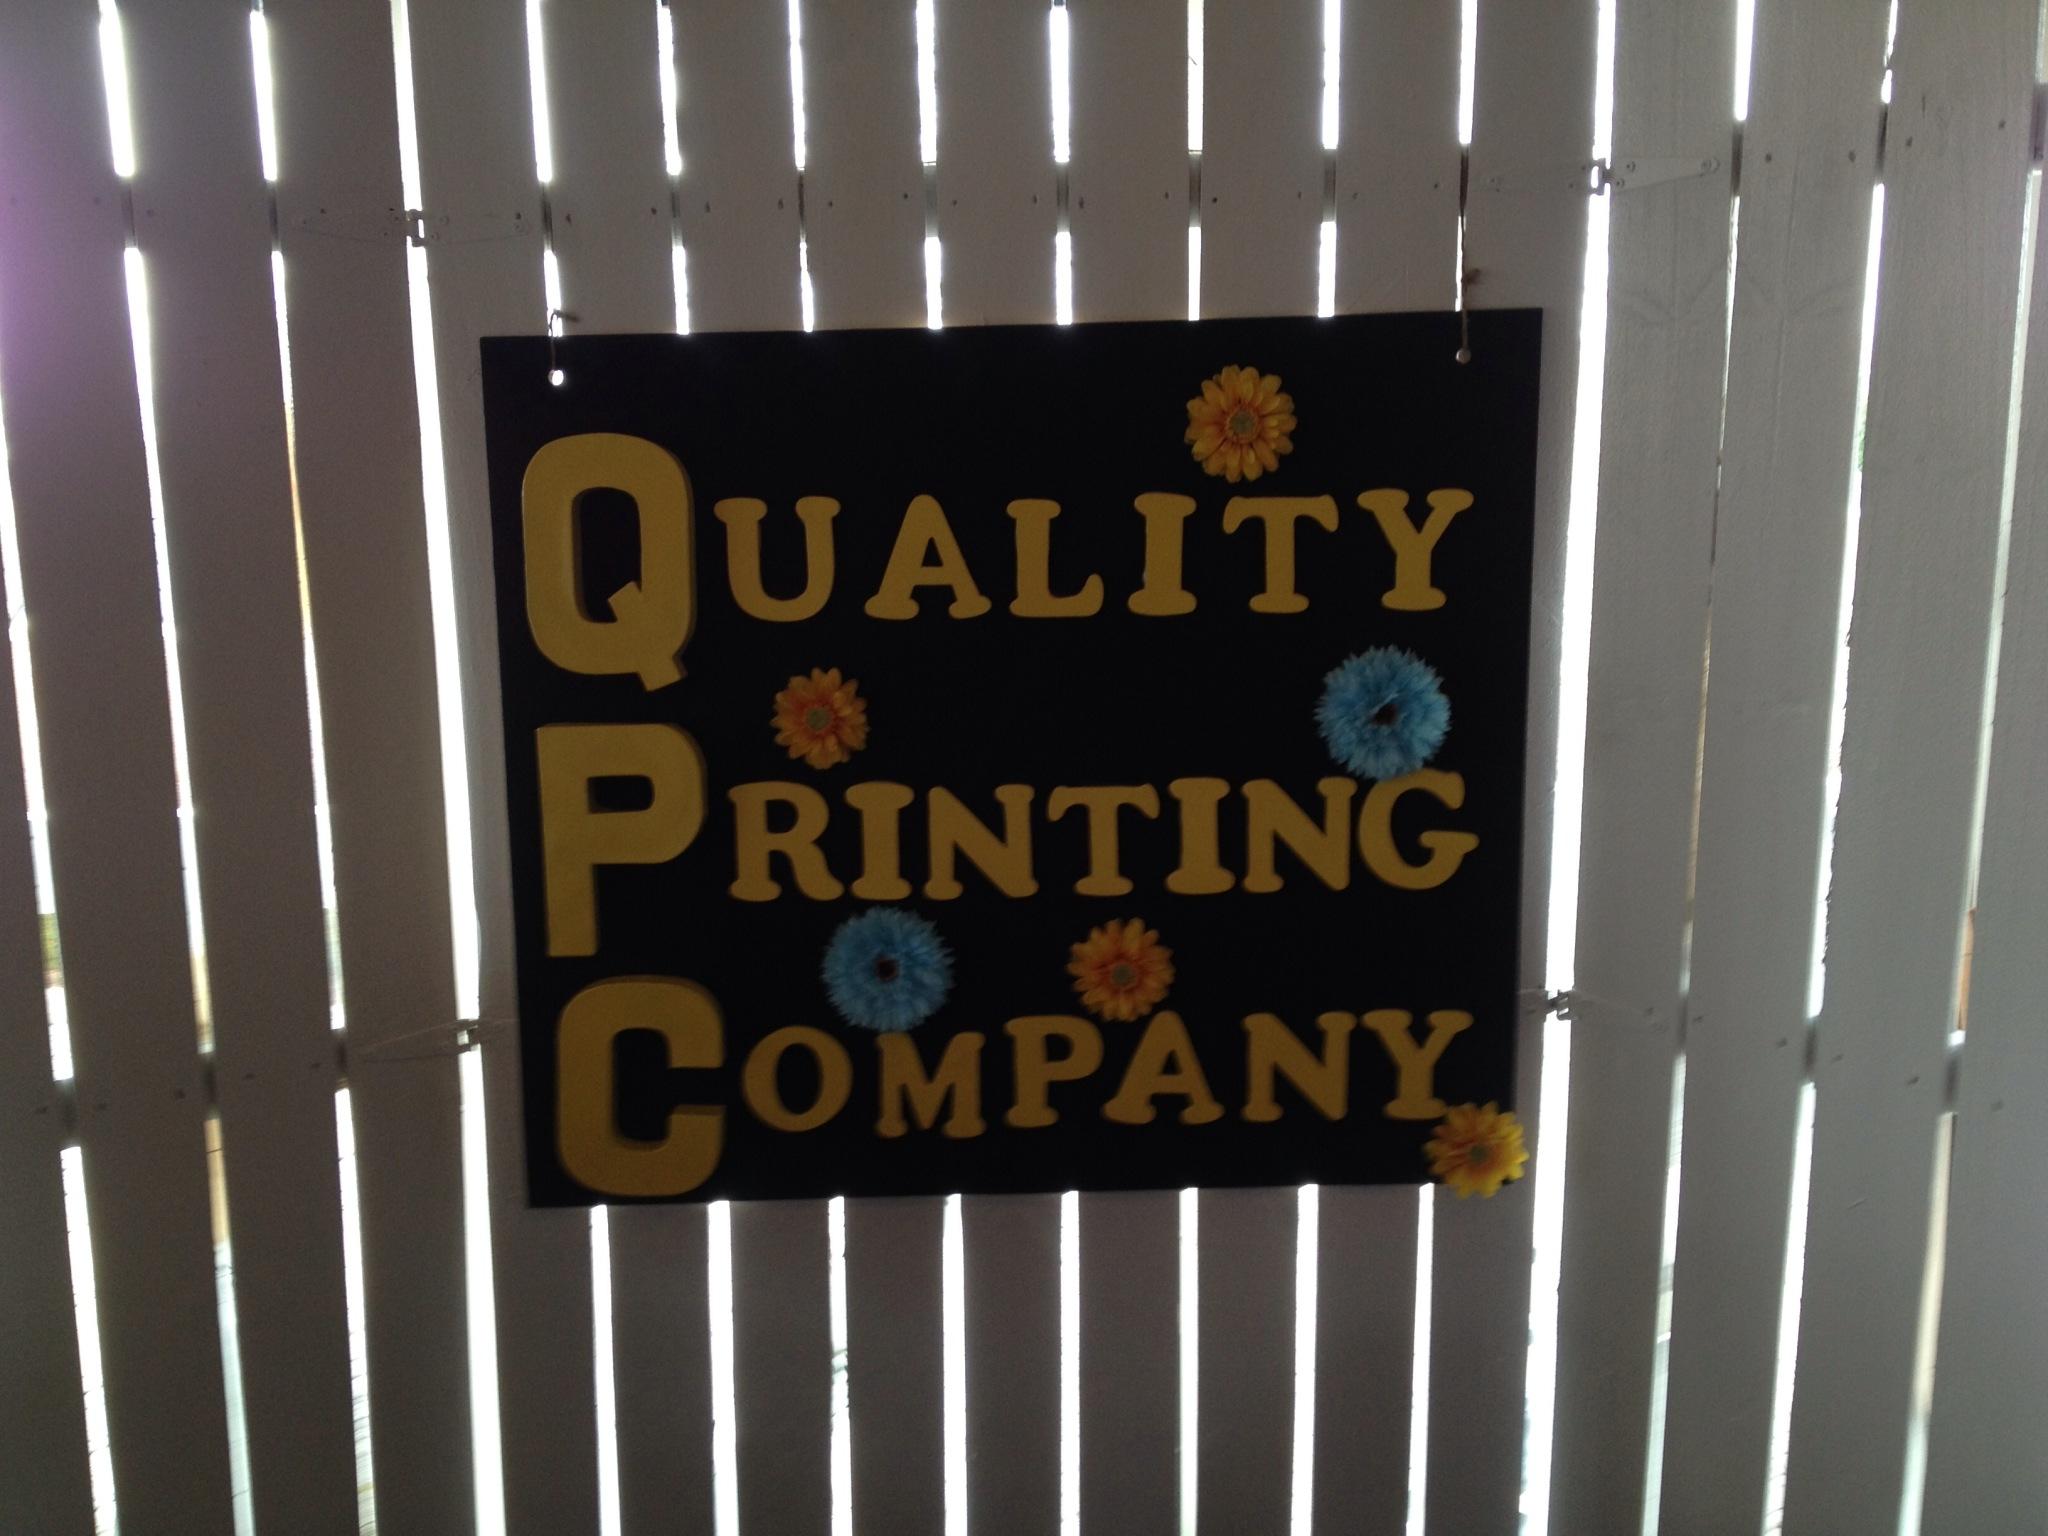 Quality Printing Company image 8